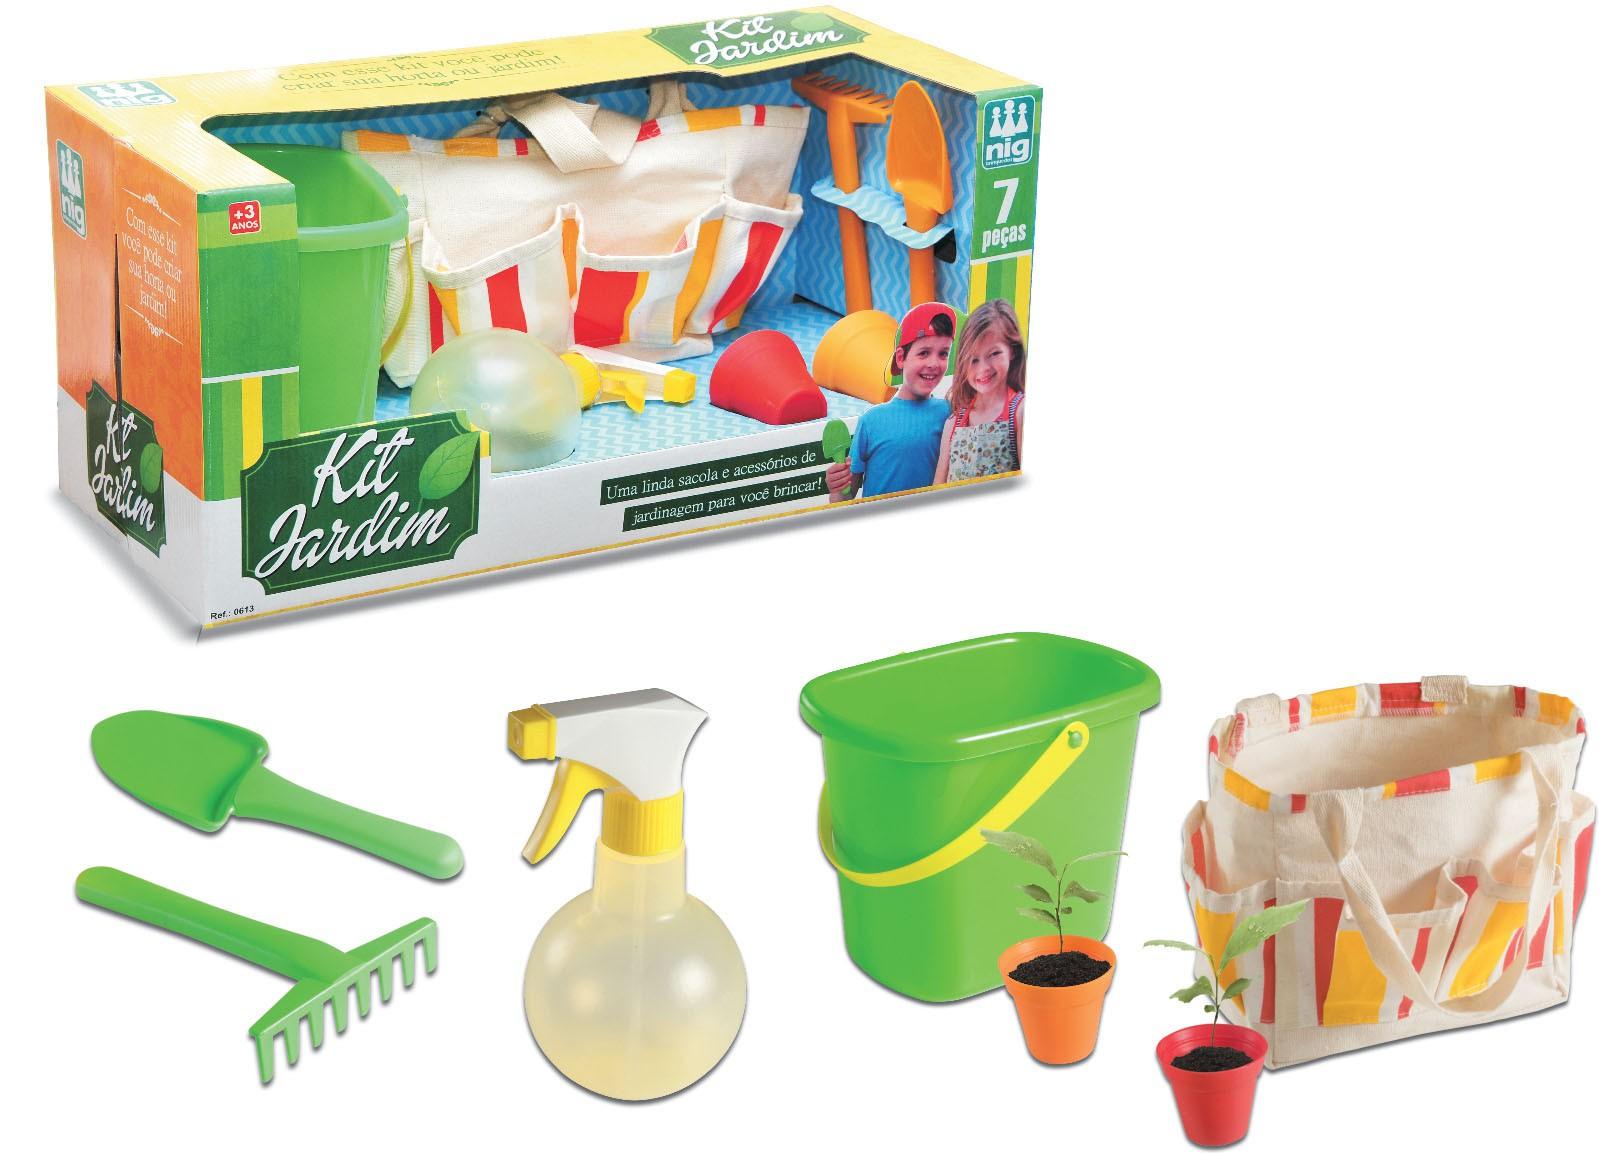 Kit Jardim - Nig Brinquedos